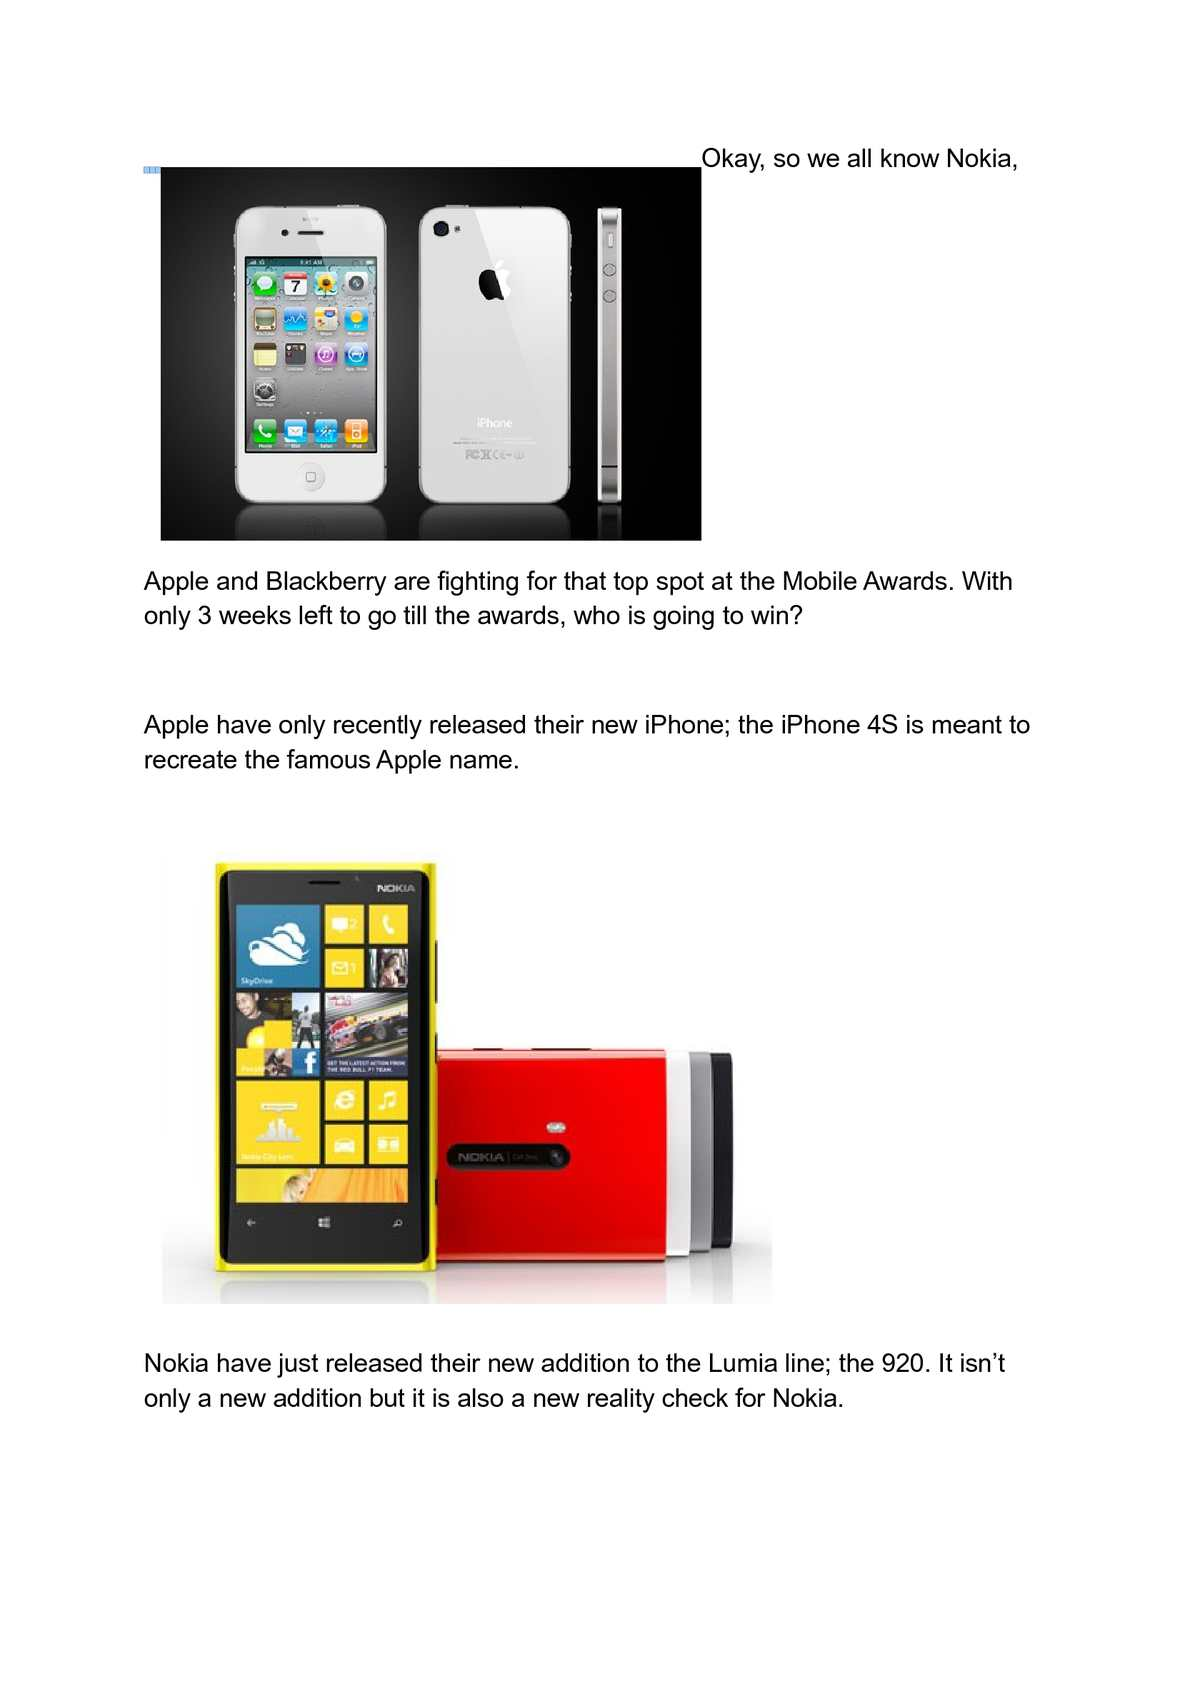 Calamo Apple Iphone 4s Vs Nokia Lumia 920 Blackberry Torch Touchscreen 9860 Review